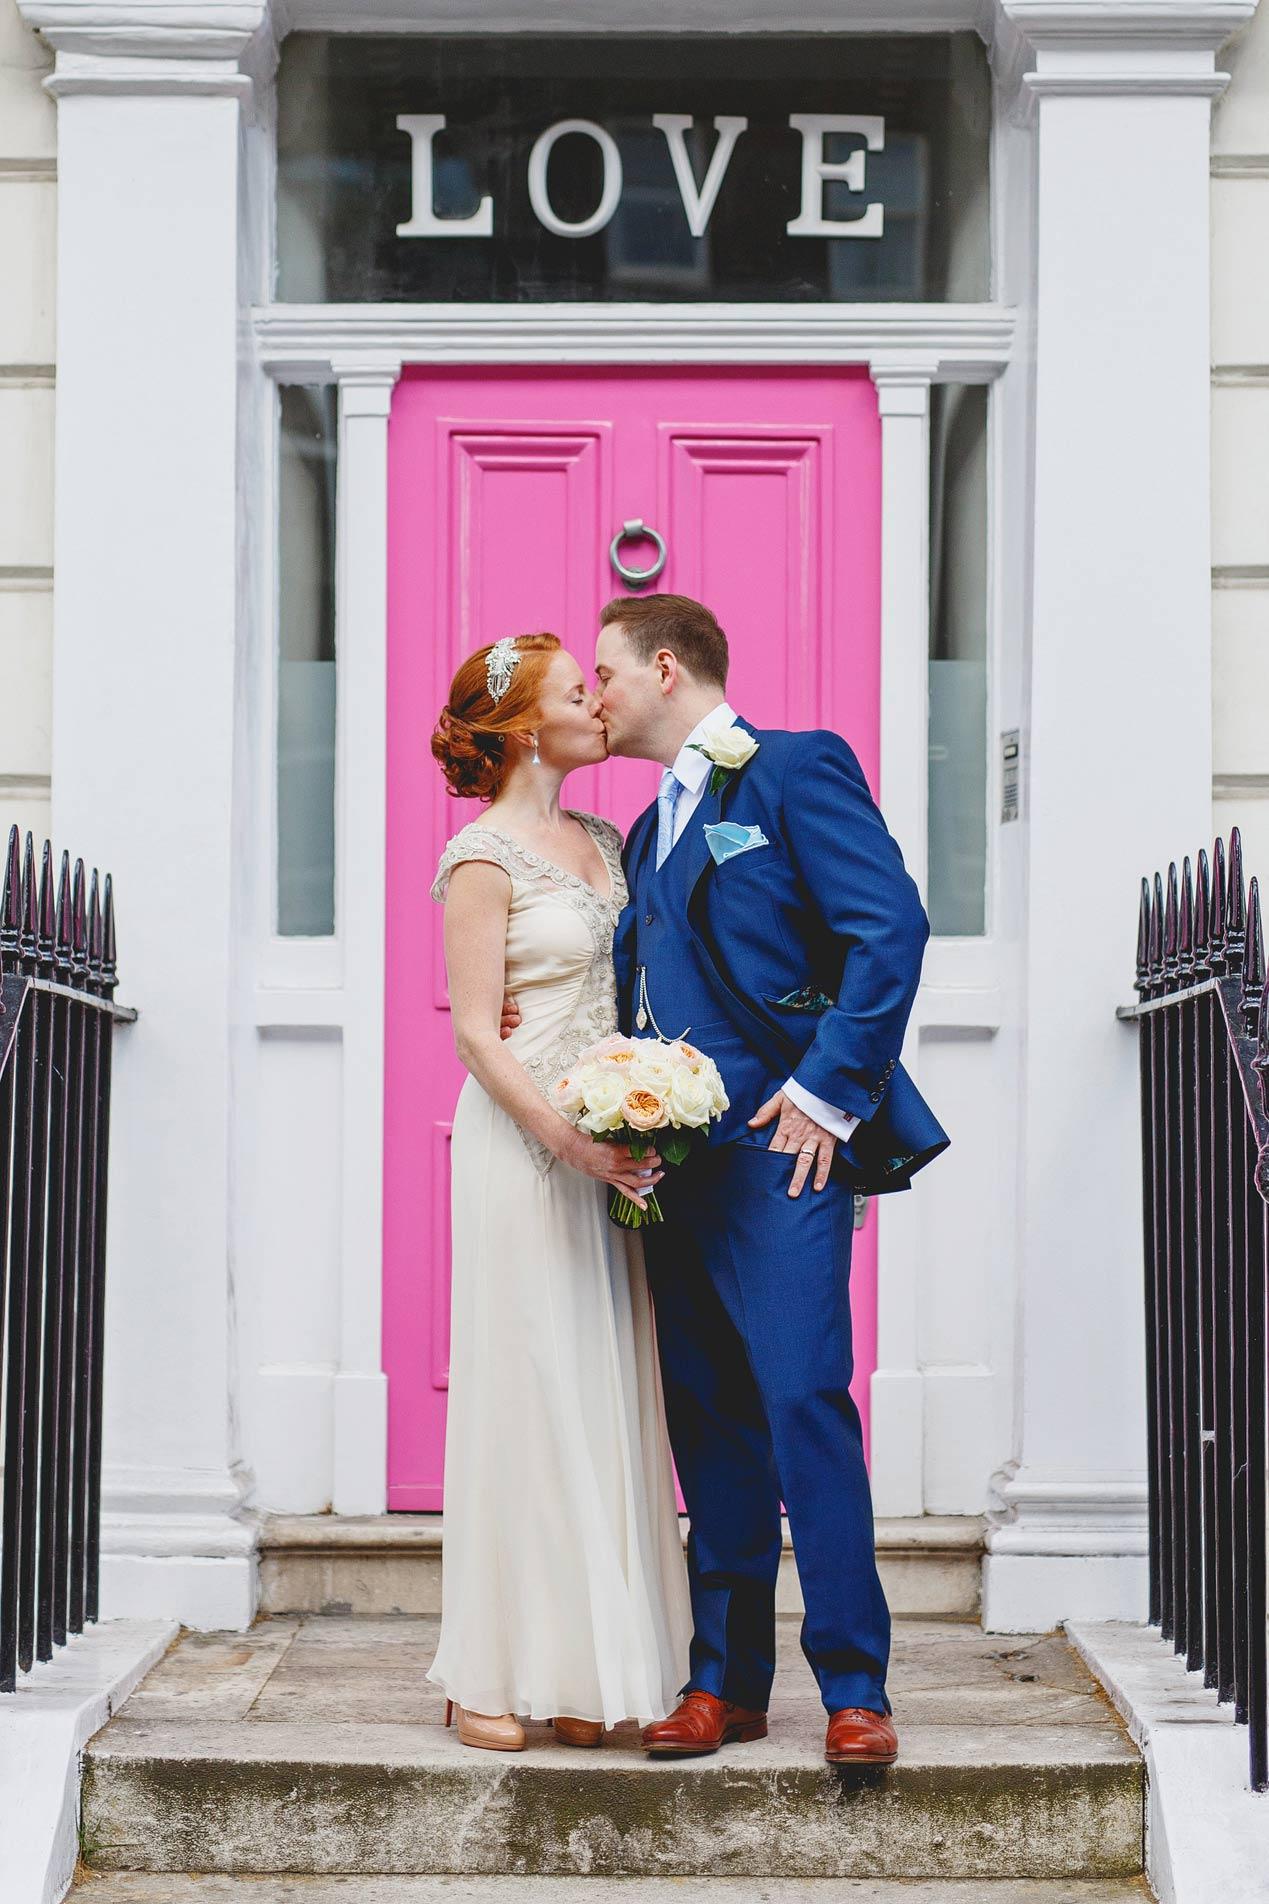 Love London wedding photographer